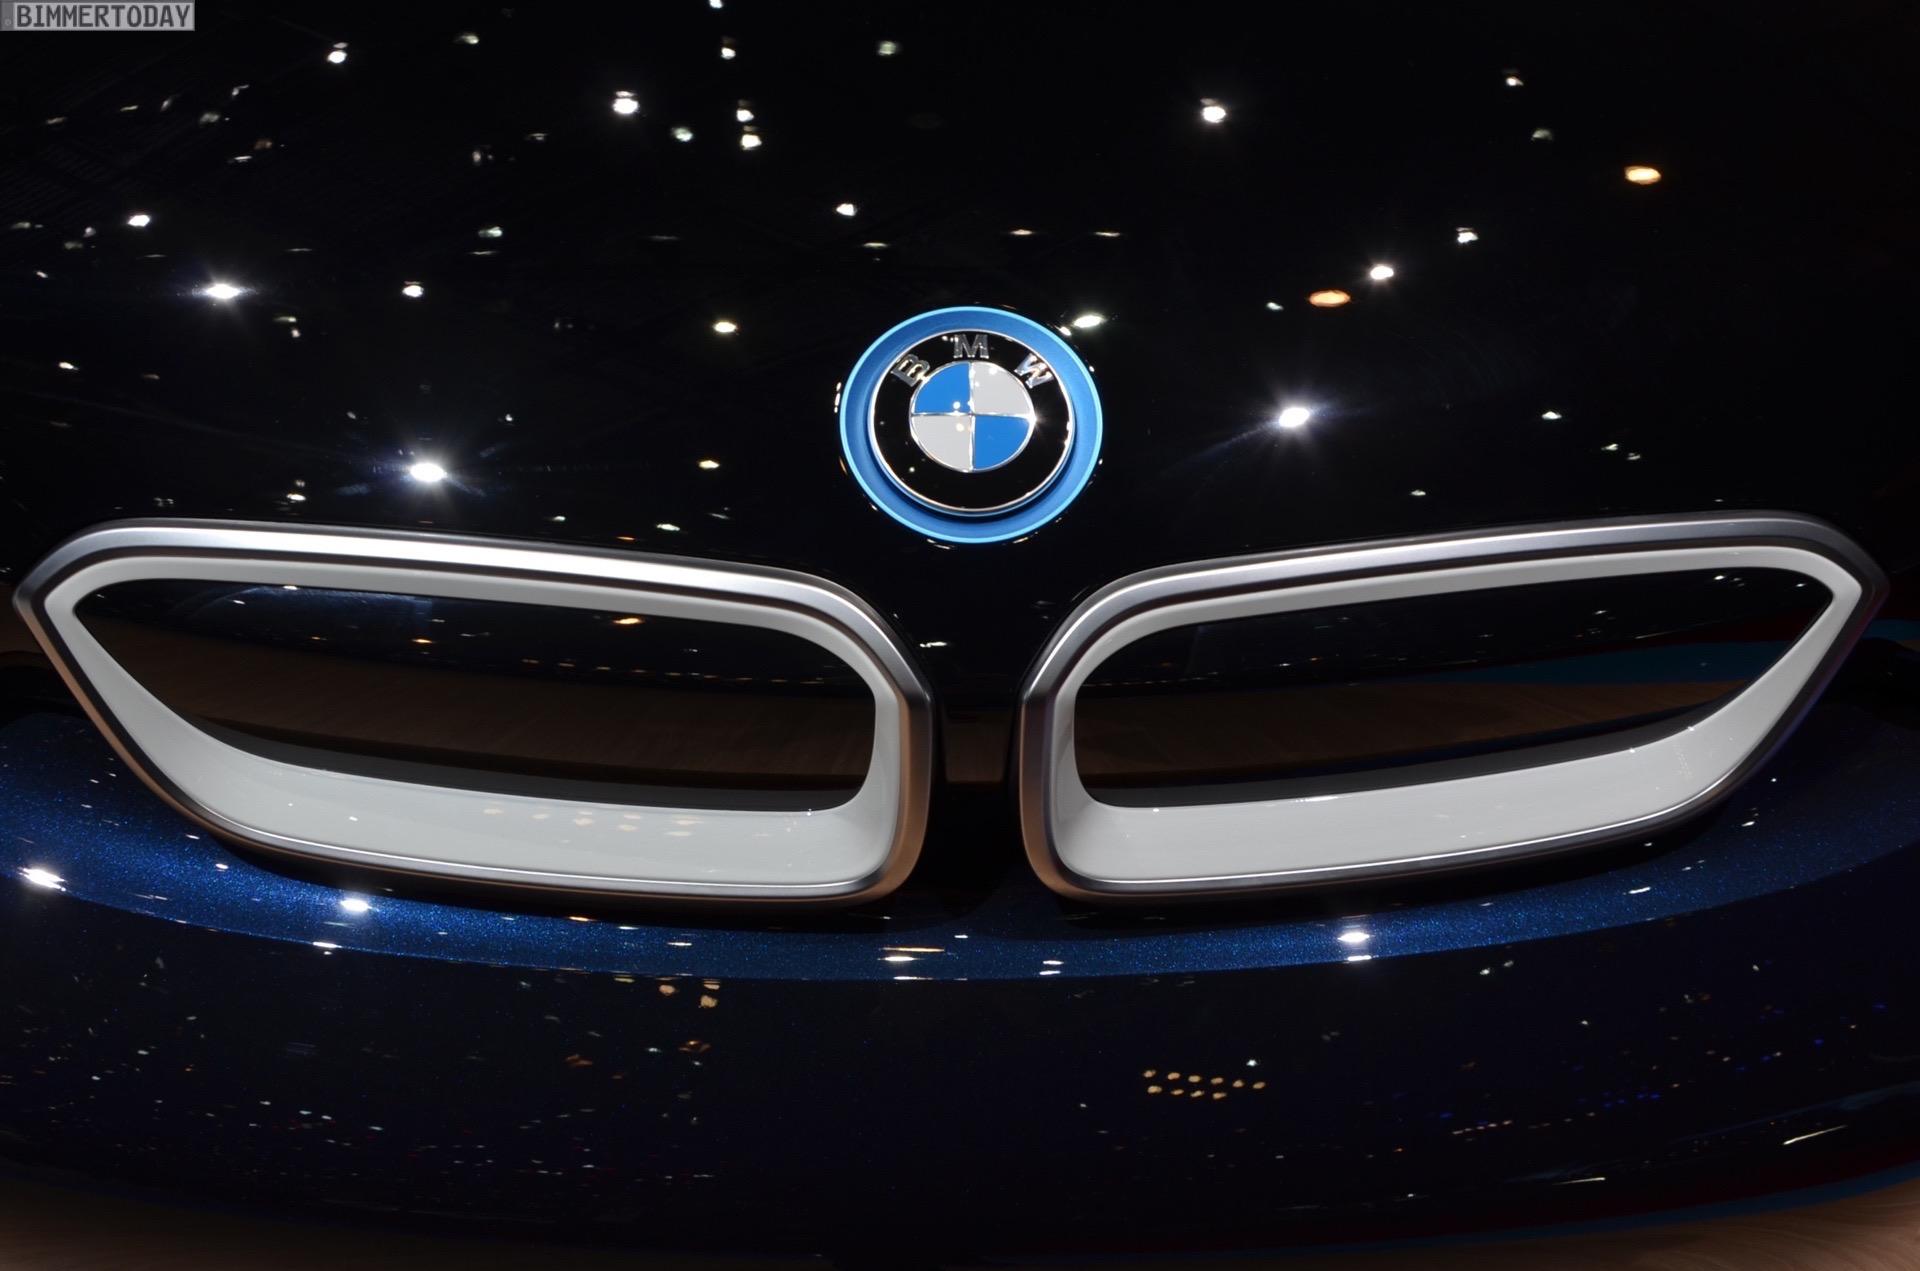 BMW i3 MR PORTER Design Limited Edition 2016 Genf Autosalon Live 05